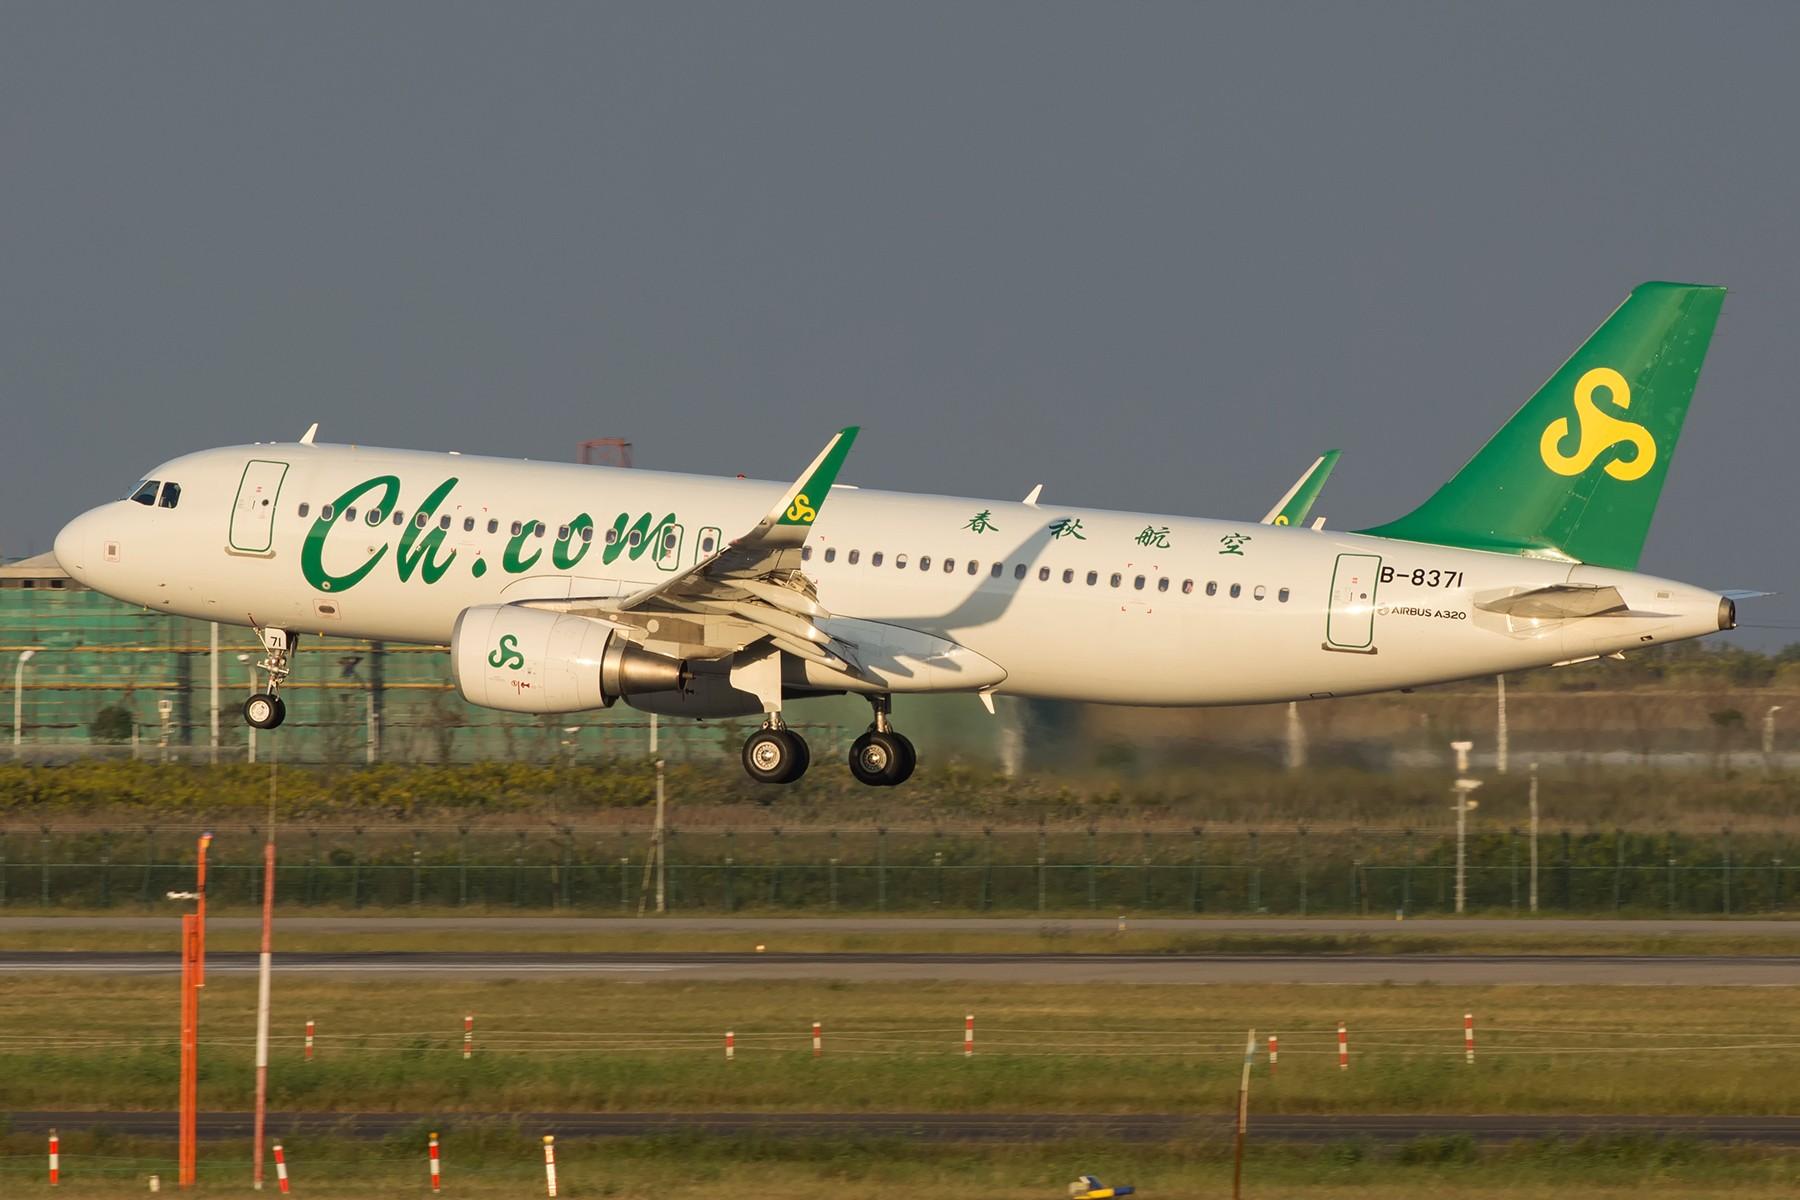 Re:[原创]【PVG】夕阳无限好,只是近黄昏 AIRBUS A320-200 B-8371 中国上海浦东国际机场